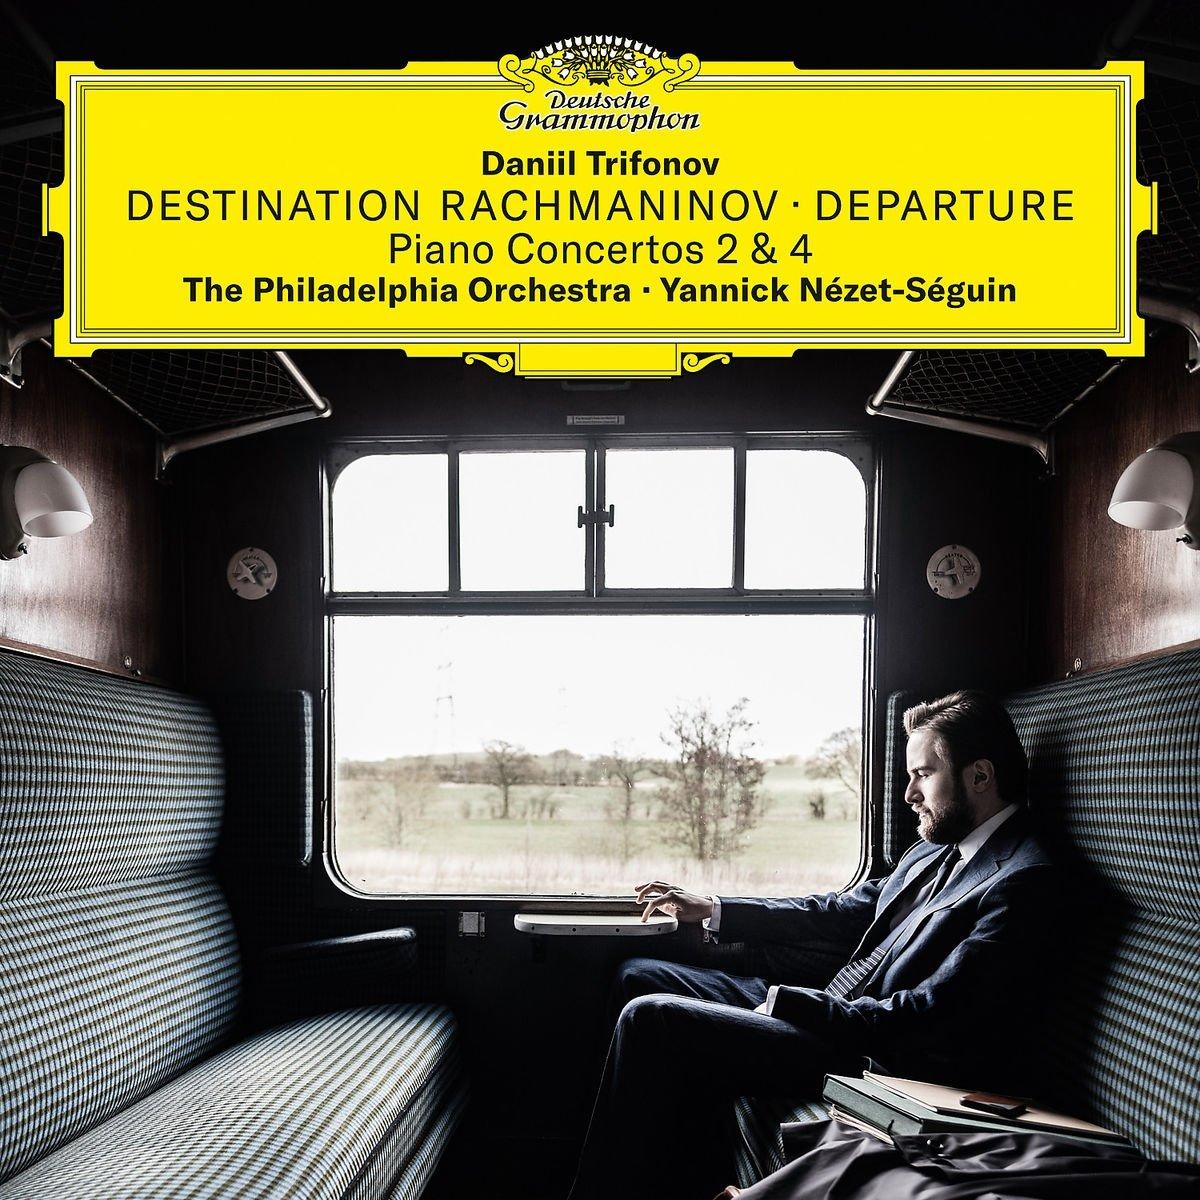 CD : Daniil Trifonov - Destination Rachmaninov - Departure